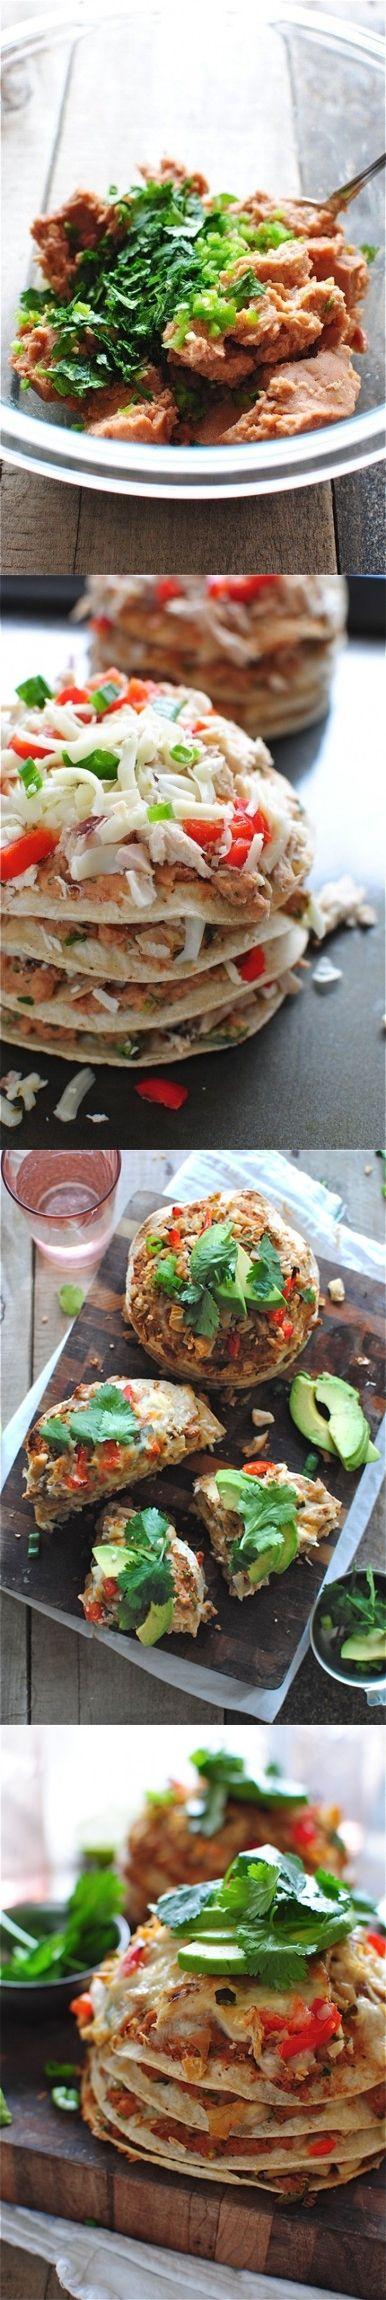 Chicken Taco Stacks Recipe http://www.fazlani.com/